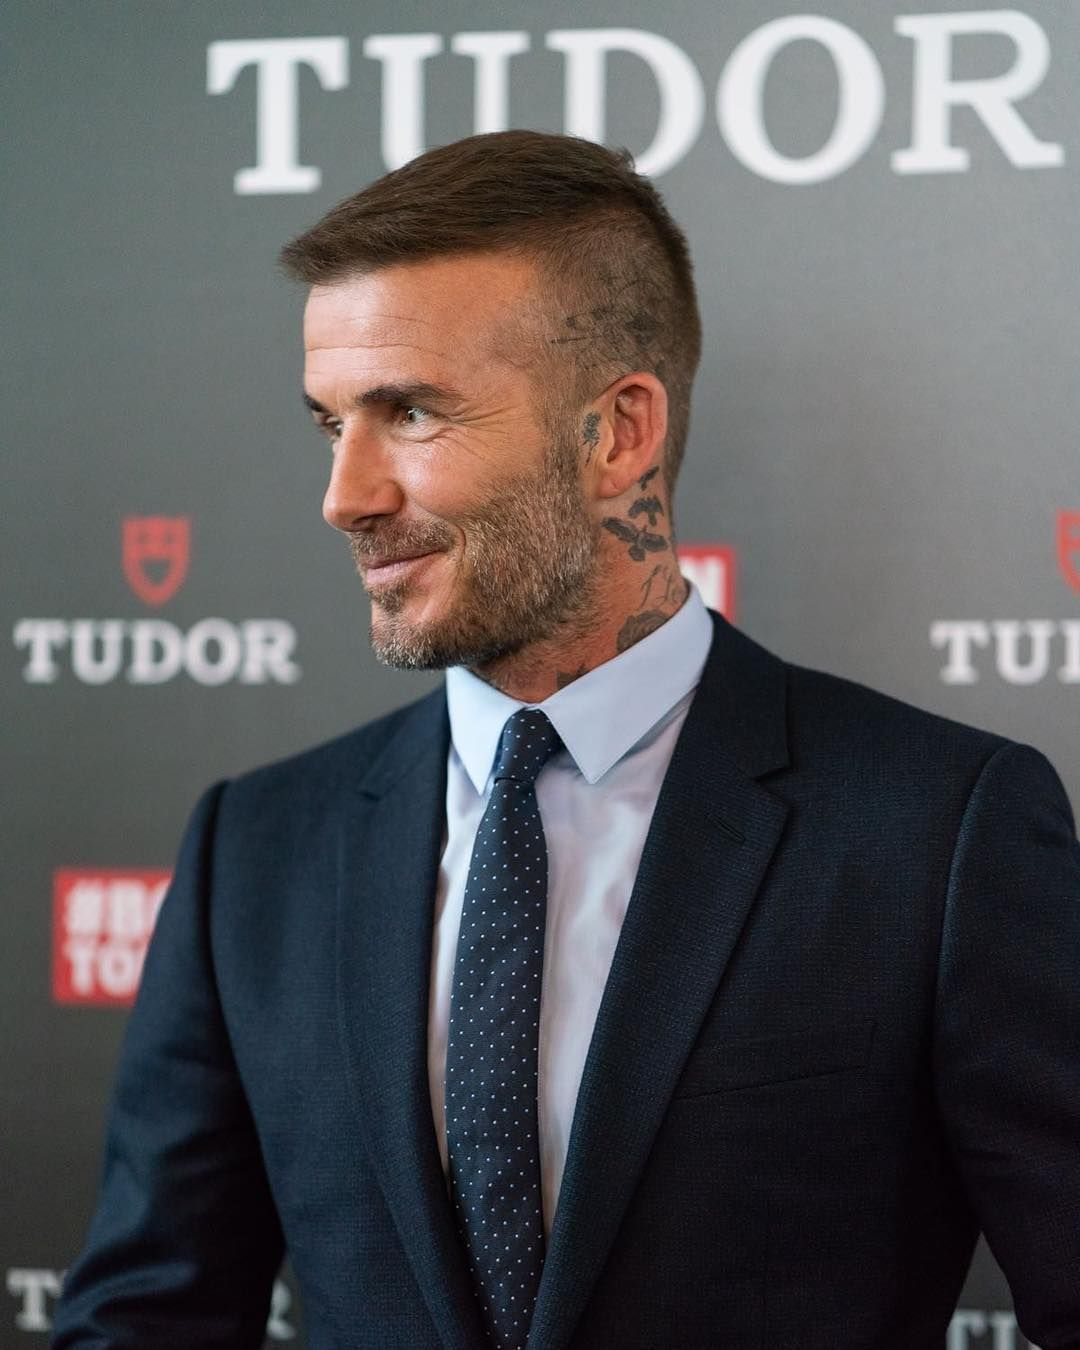 David Beckham Davidbeckham On Instagram Always A Pleasure To Be Back In Milan This Time Beckham Hair David Beckham Haircut David Beckham Hairstyle Short